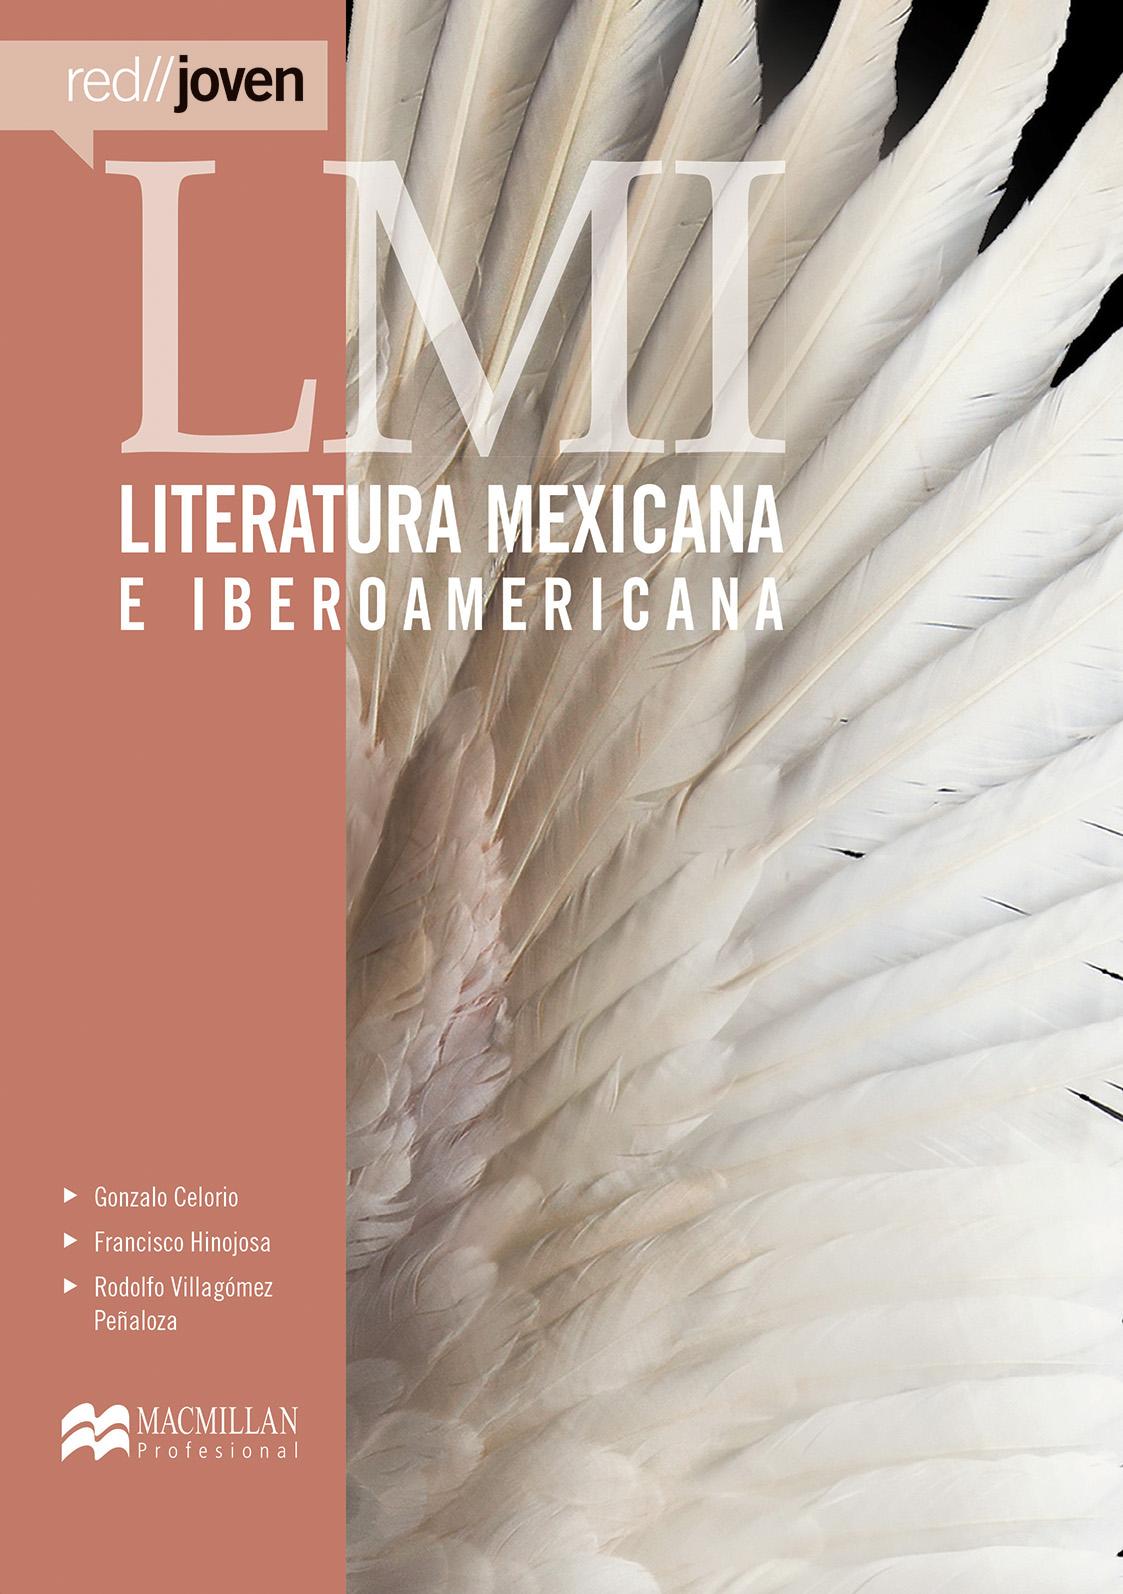 redjoven_Literatura Iberoamericana